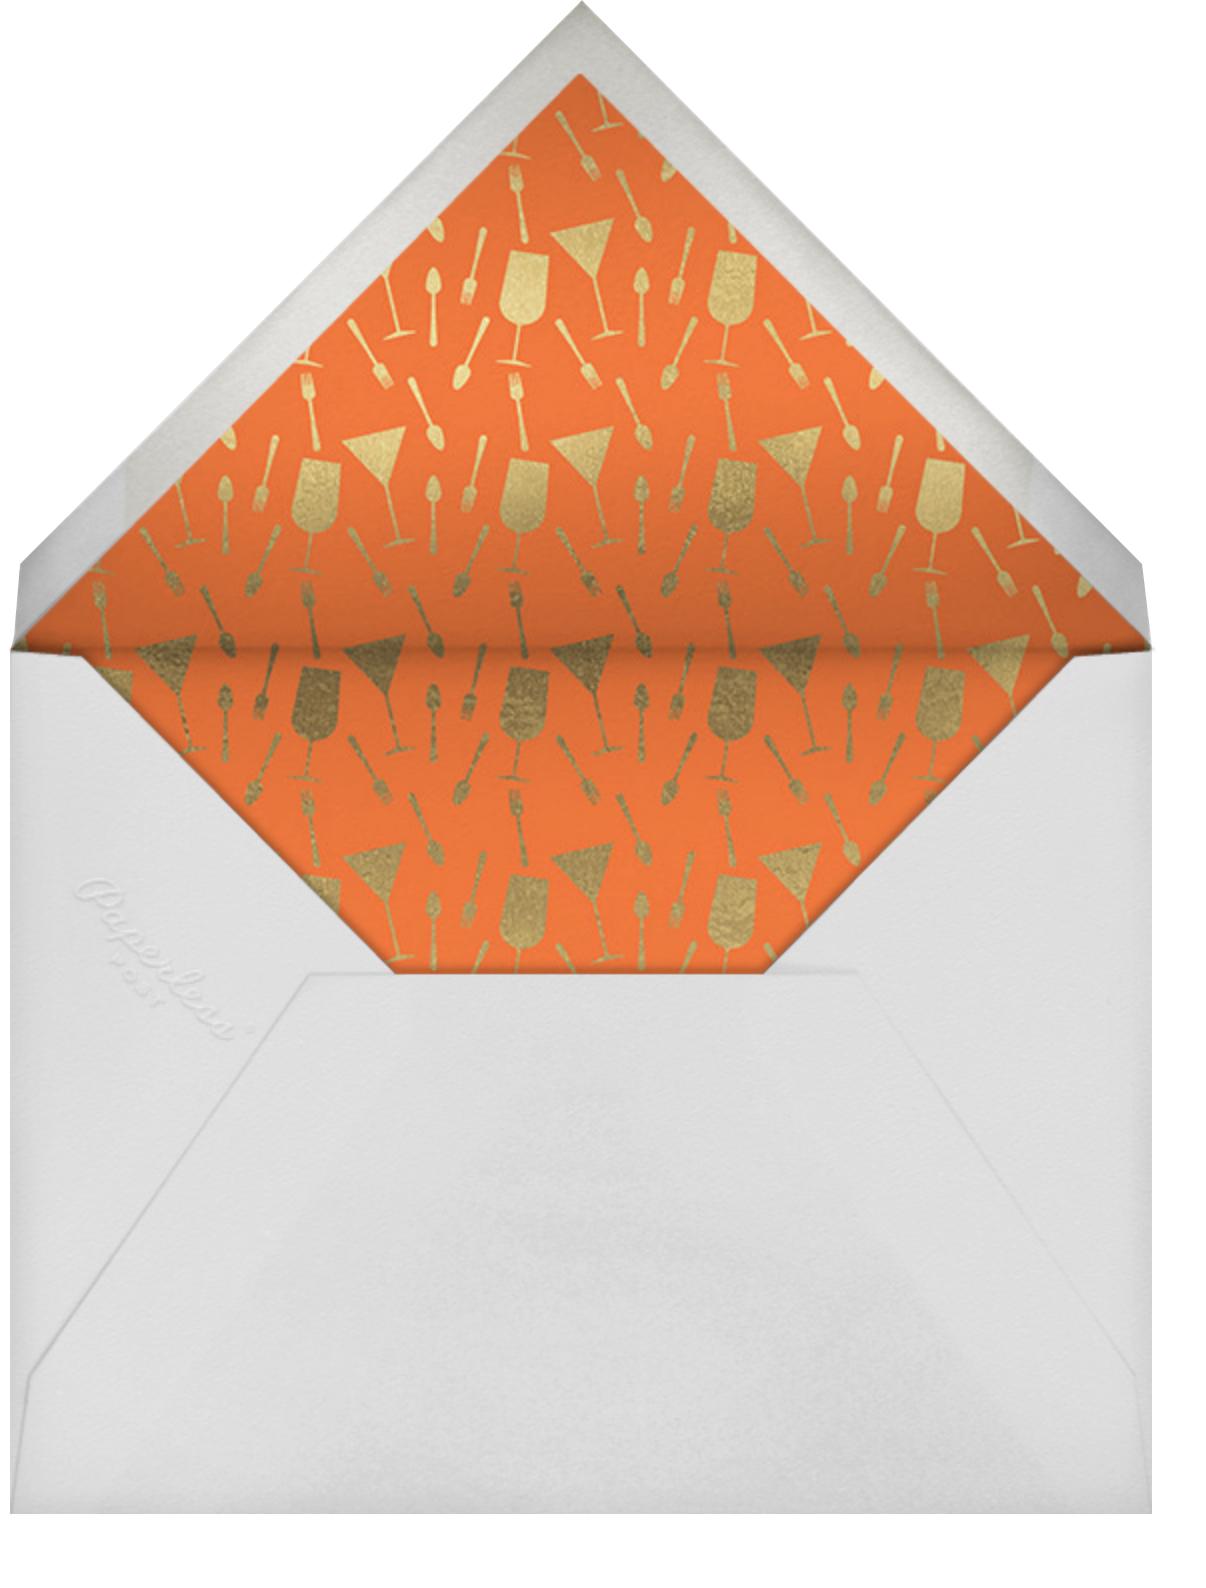 Making Merry - Paperless Post - Winter entertaining - envelope back